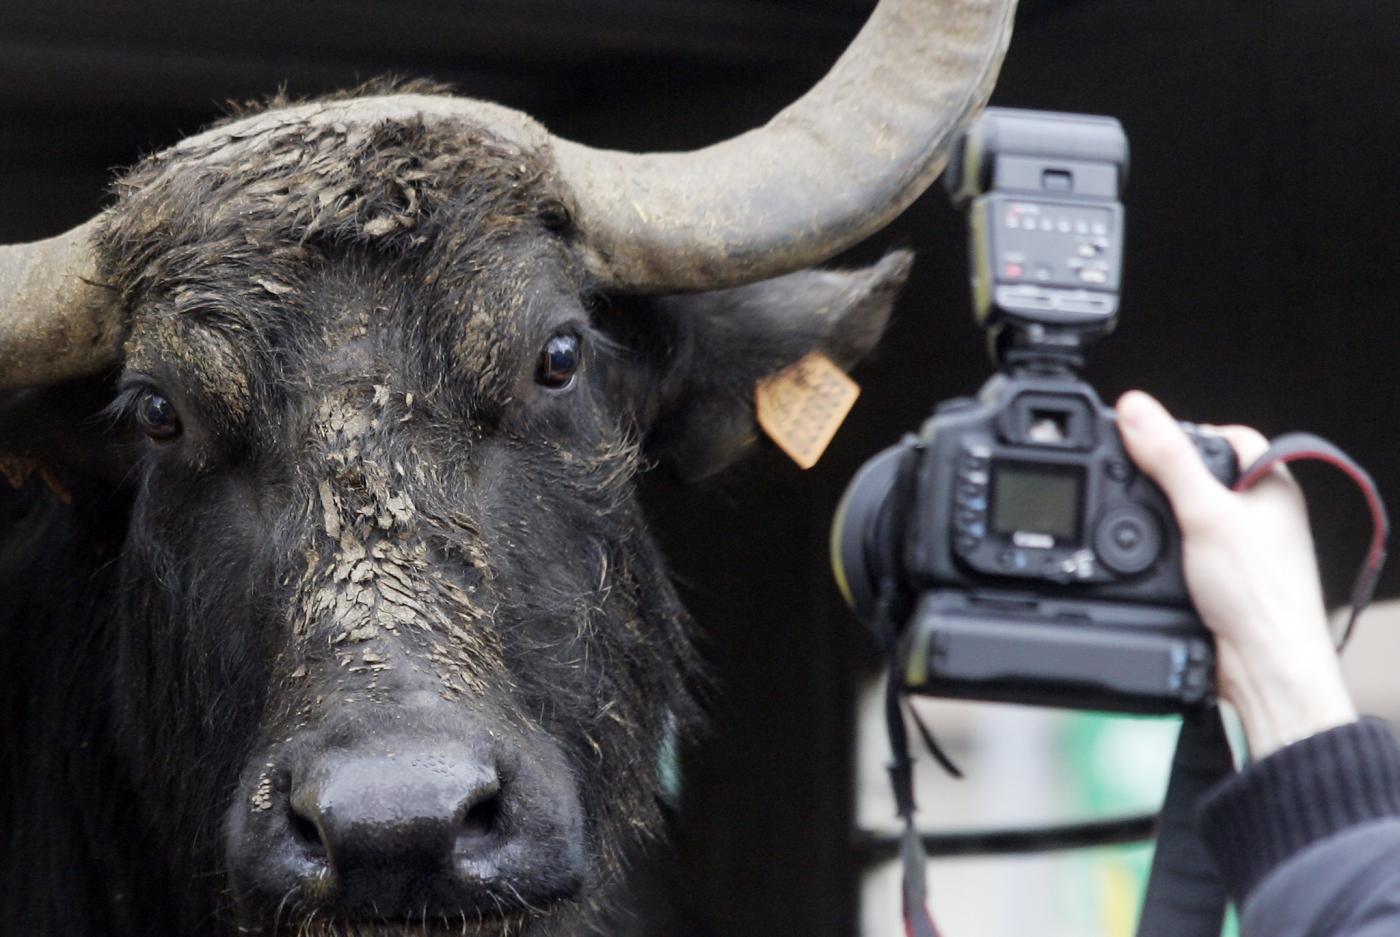 Perché si dice 'bufala'?